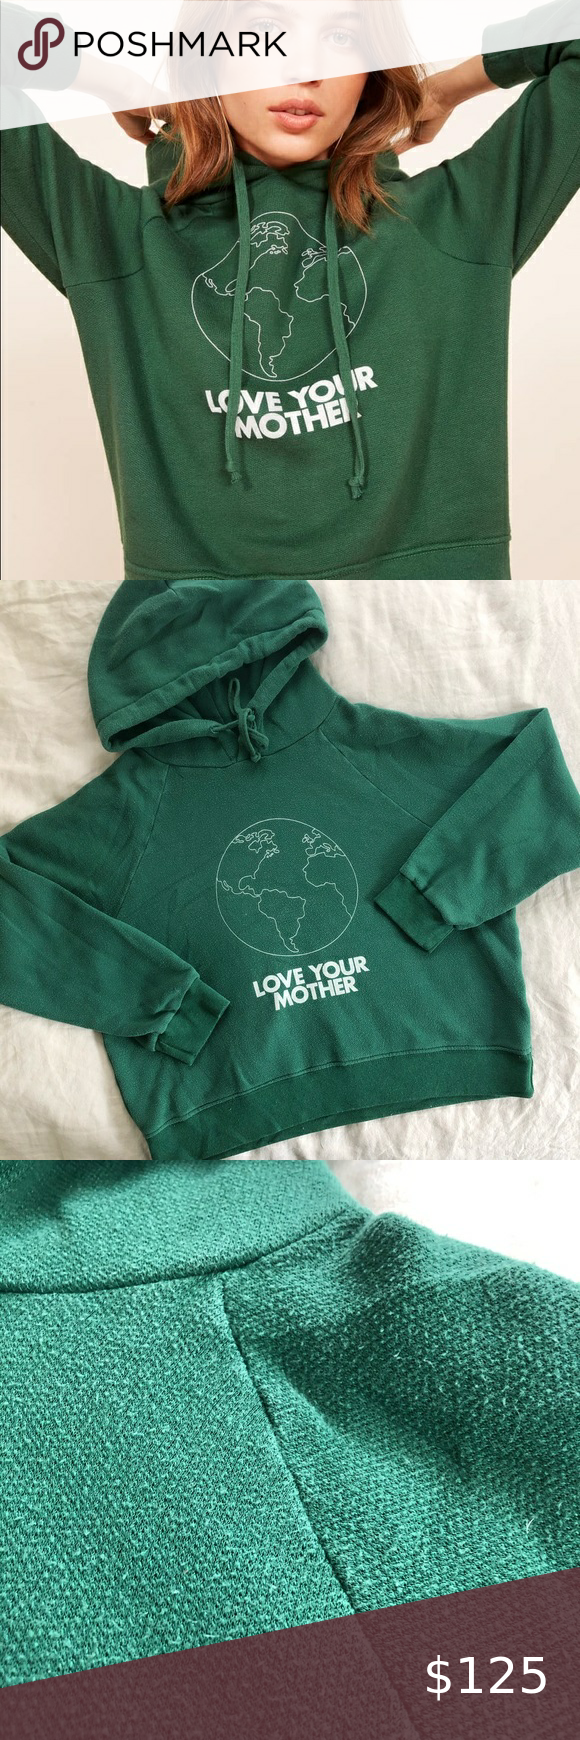 Rare Reformation Love Your Mother Sweatshirt Sweatshirts Sweatshirt Tops Sweatshirts Hoodie [ 1740 x 580 Pixel ]